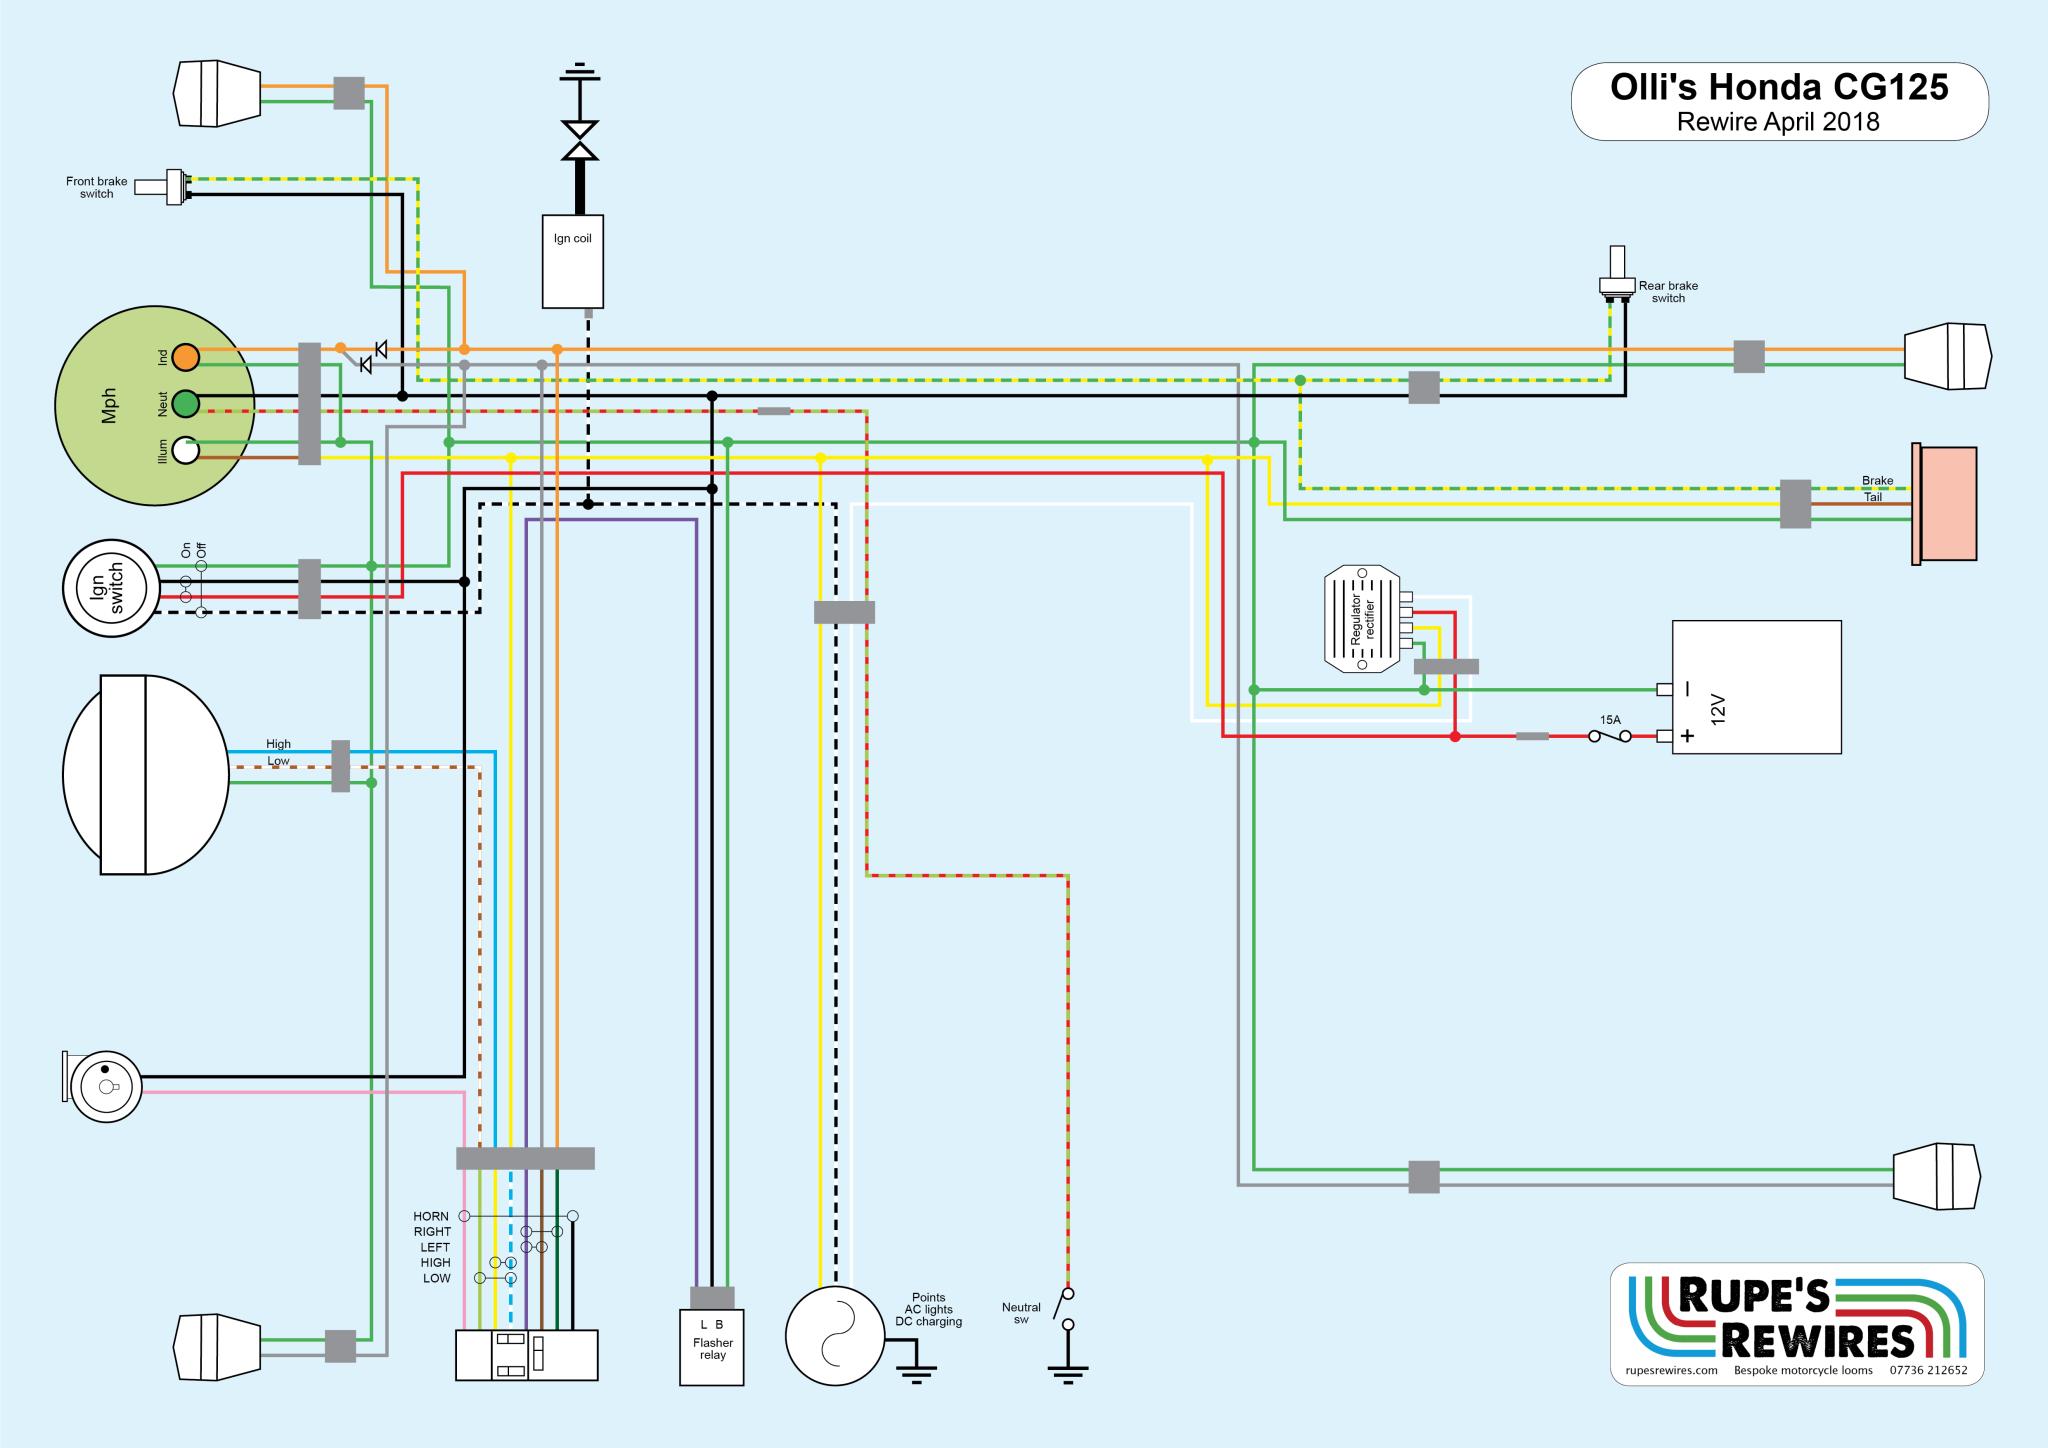 Honda Cg 125 Wiring Diagram | Wiring Diagram on 250cc scooter wiring diagram, electric bicycle wiring diagram, electric scooter wiring diagram, 110cc atv wiring diagram, 150cc scooter wiring diagram, off road wiring diagram, computer case wiring diagram, mixer wiring diagram, 50cc atv wiring diagram, moped wiring diagram, 150cc atv wiring diagram, 50cc scooter wiring diagram, engine wiring diagram, chopper wiring diagram,